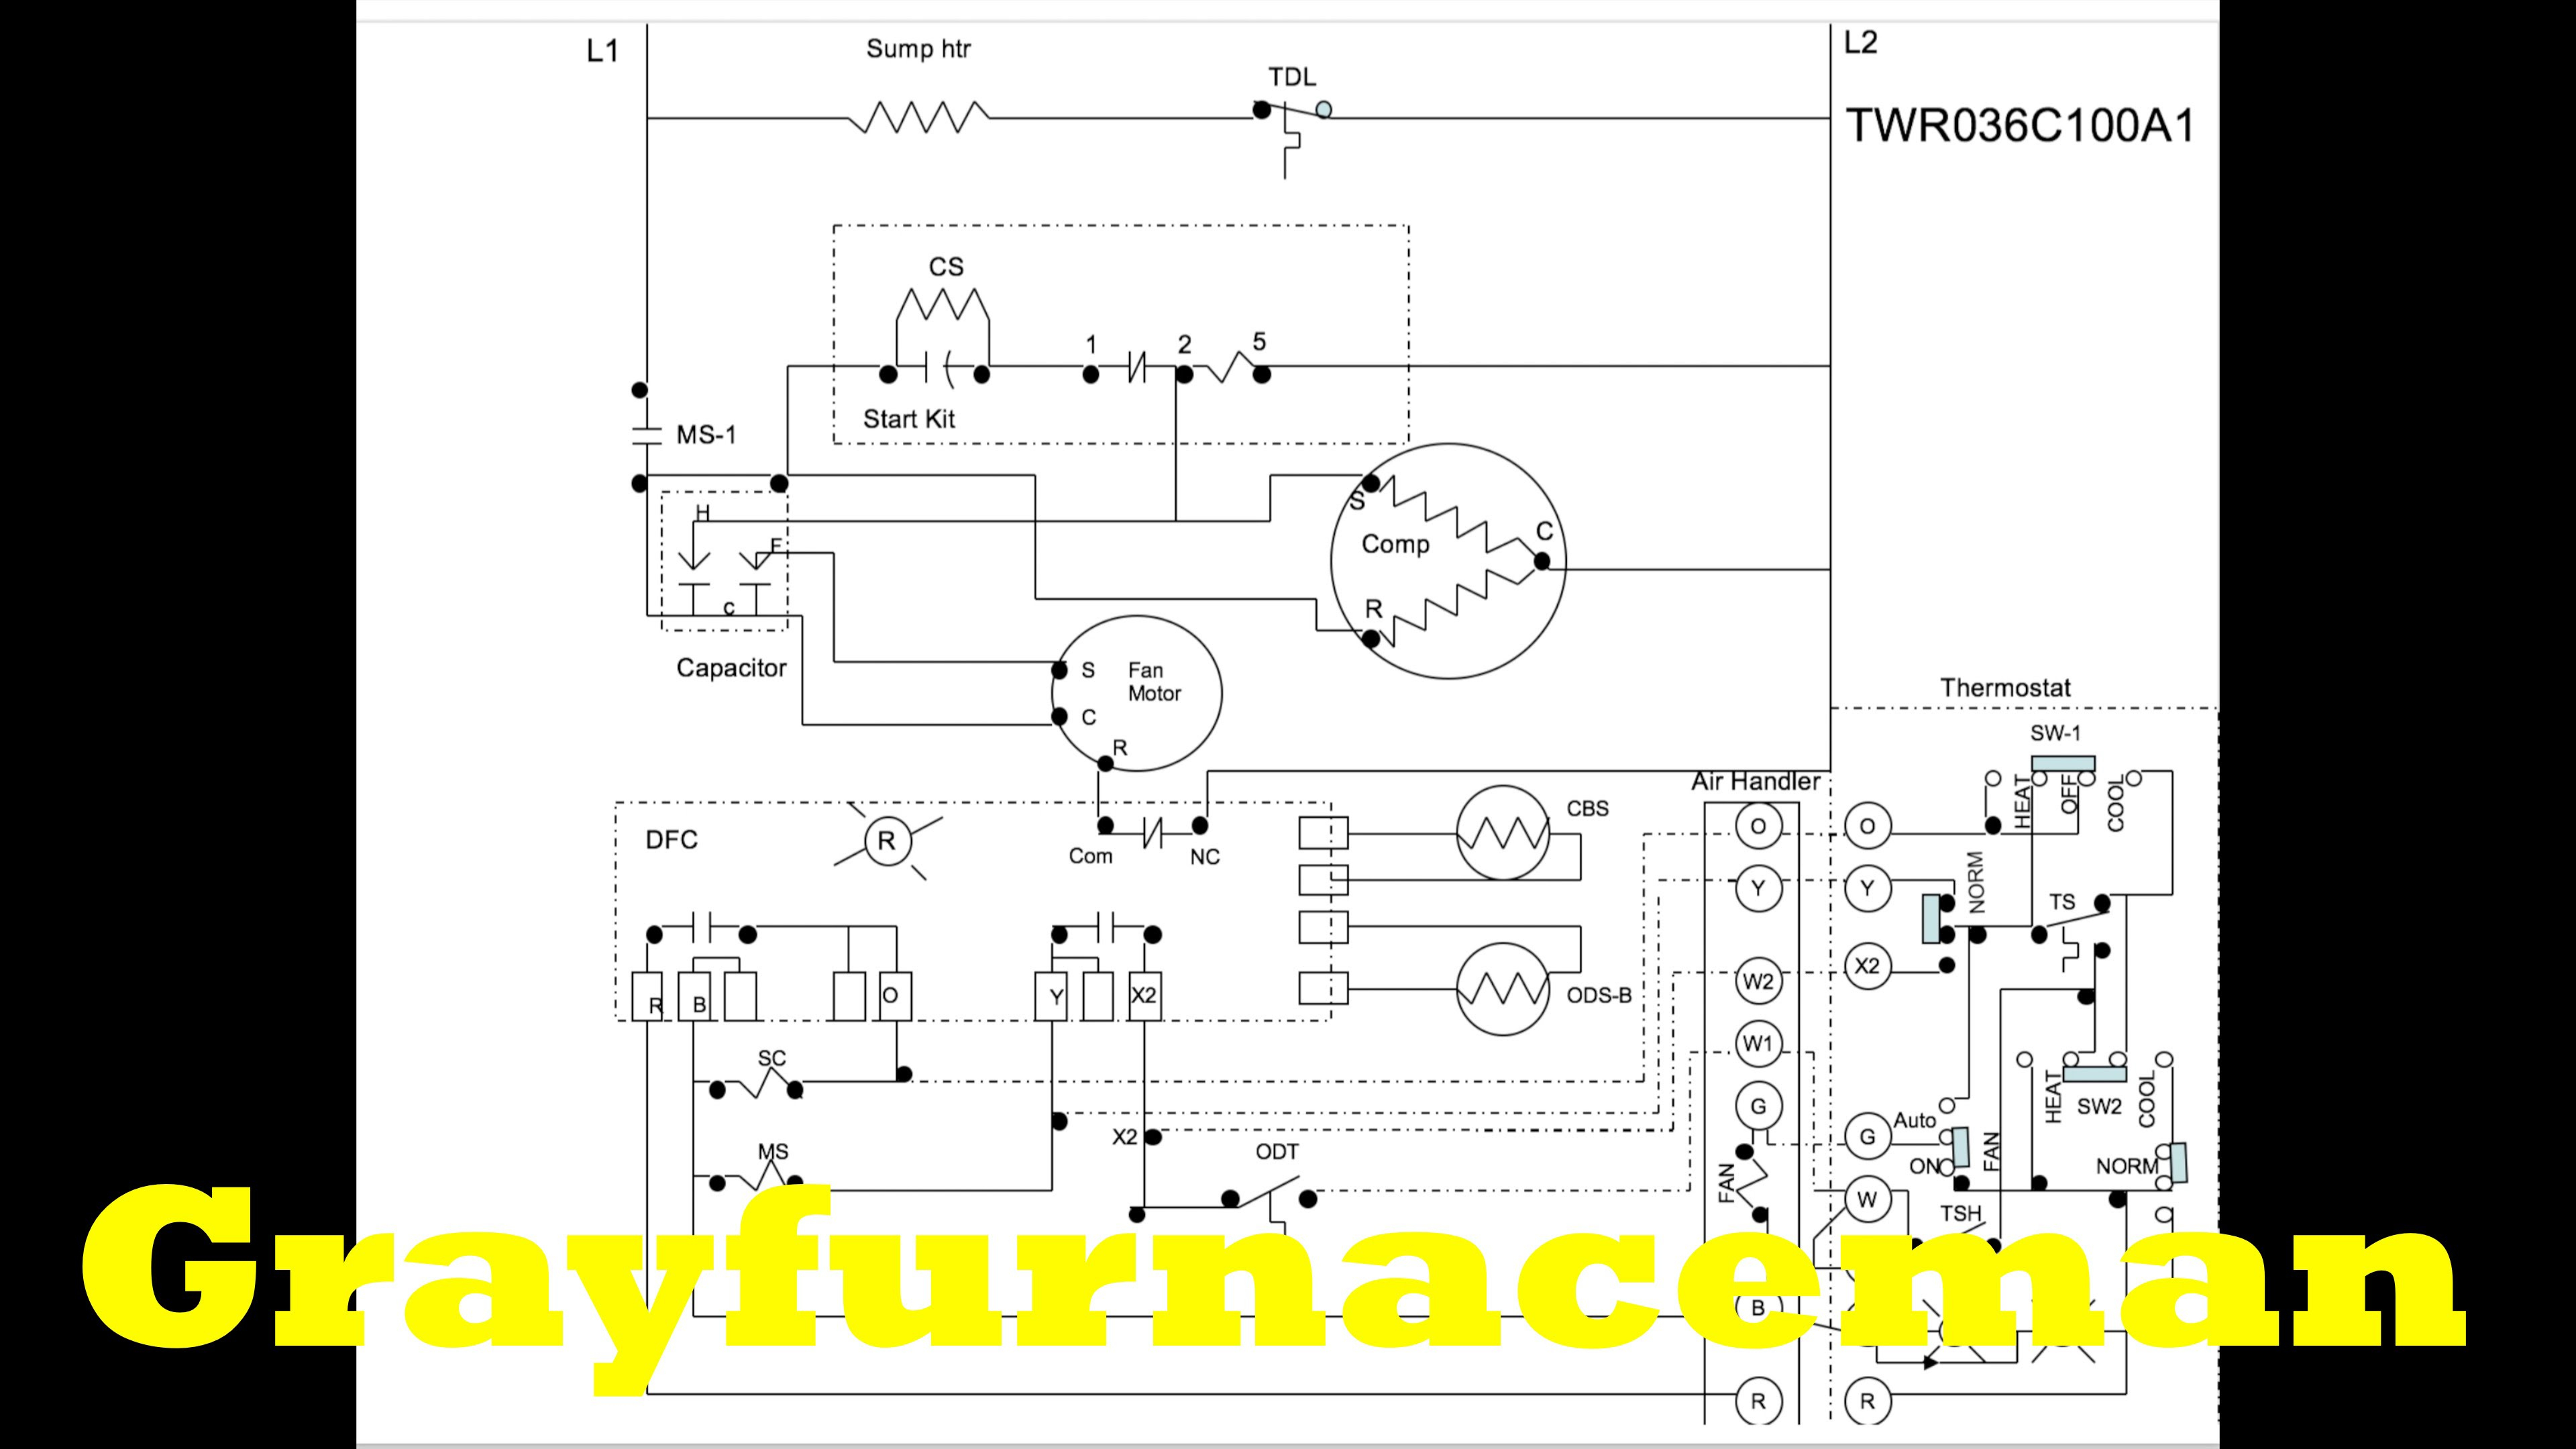 Goodman Heat Pump Thermostat Wiring Diagram   Schematic Diagram - Nest Thermostat Wiring Diagram Heat Pump